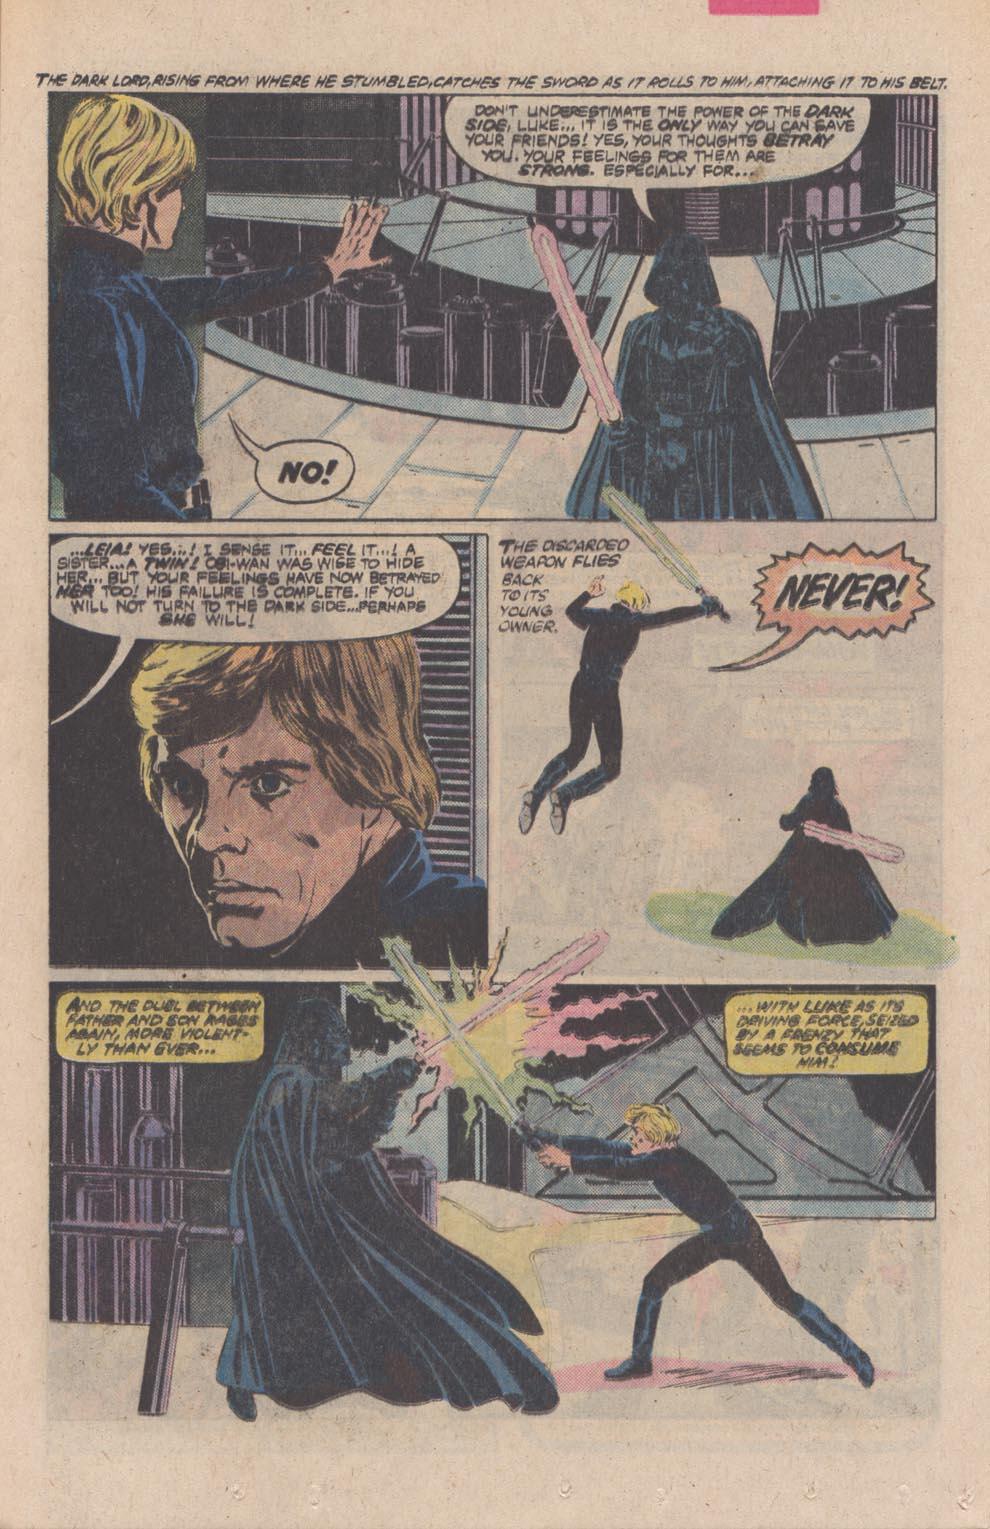 Read online Star Wars: Return of the Jedi comic -  Issue #4 - 12